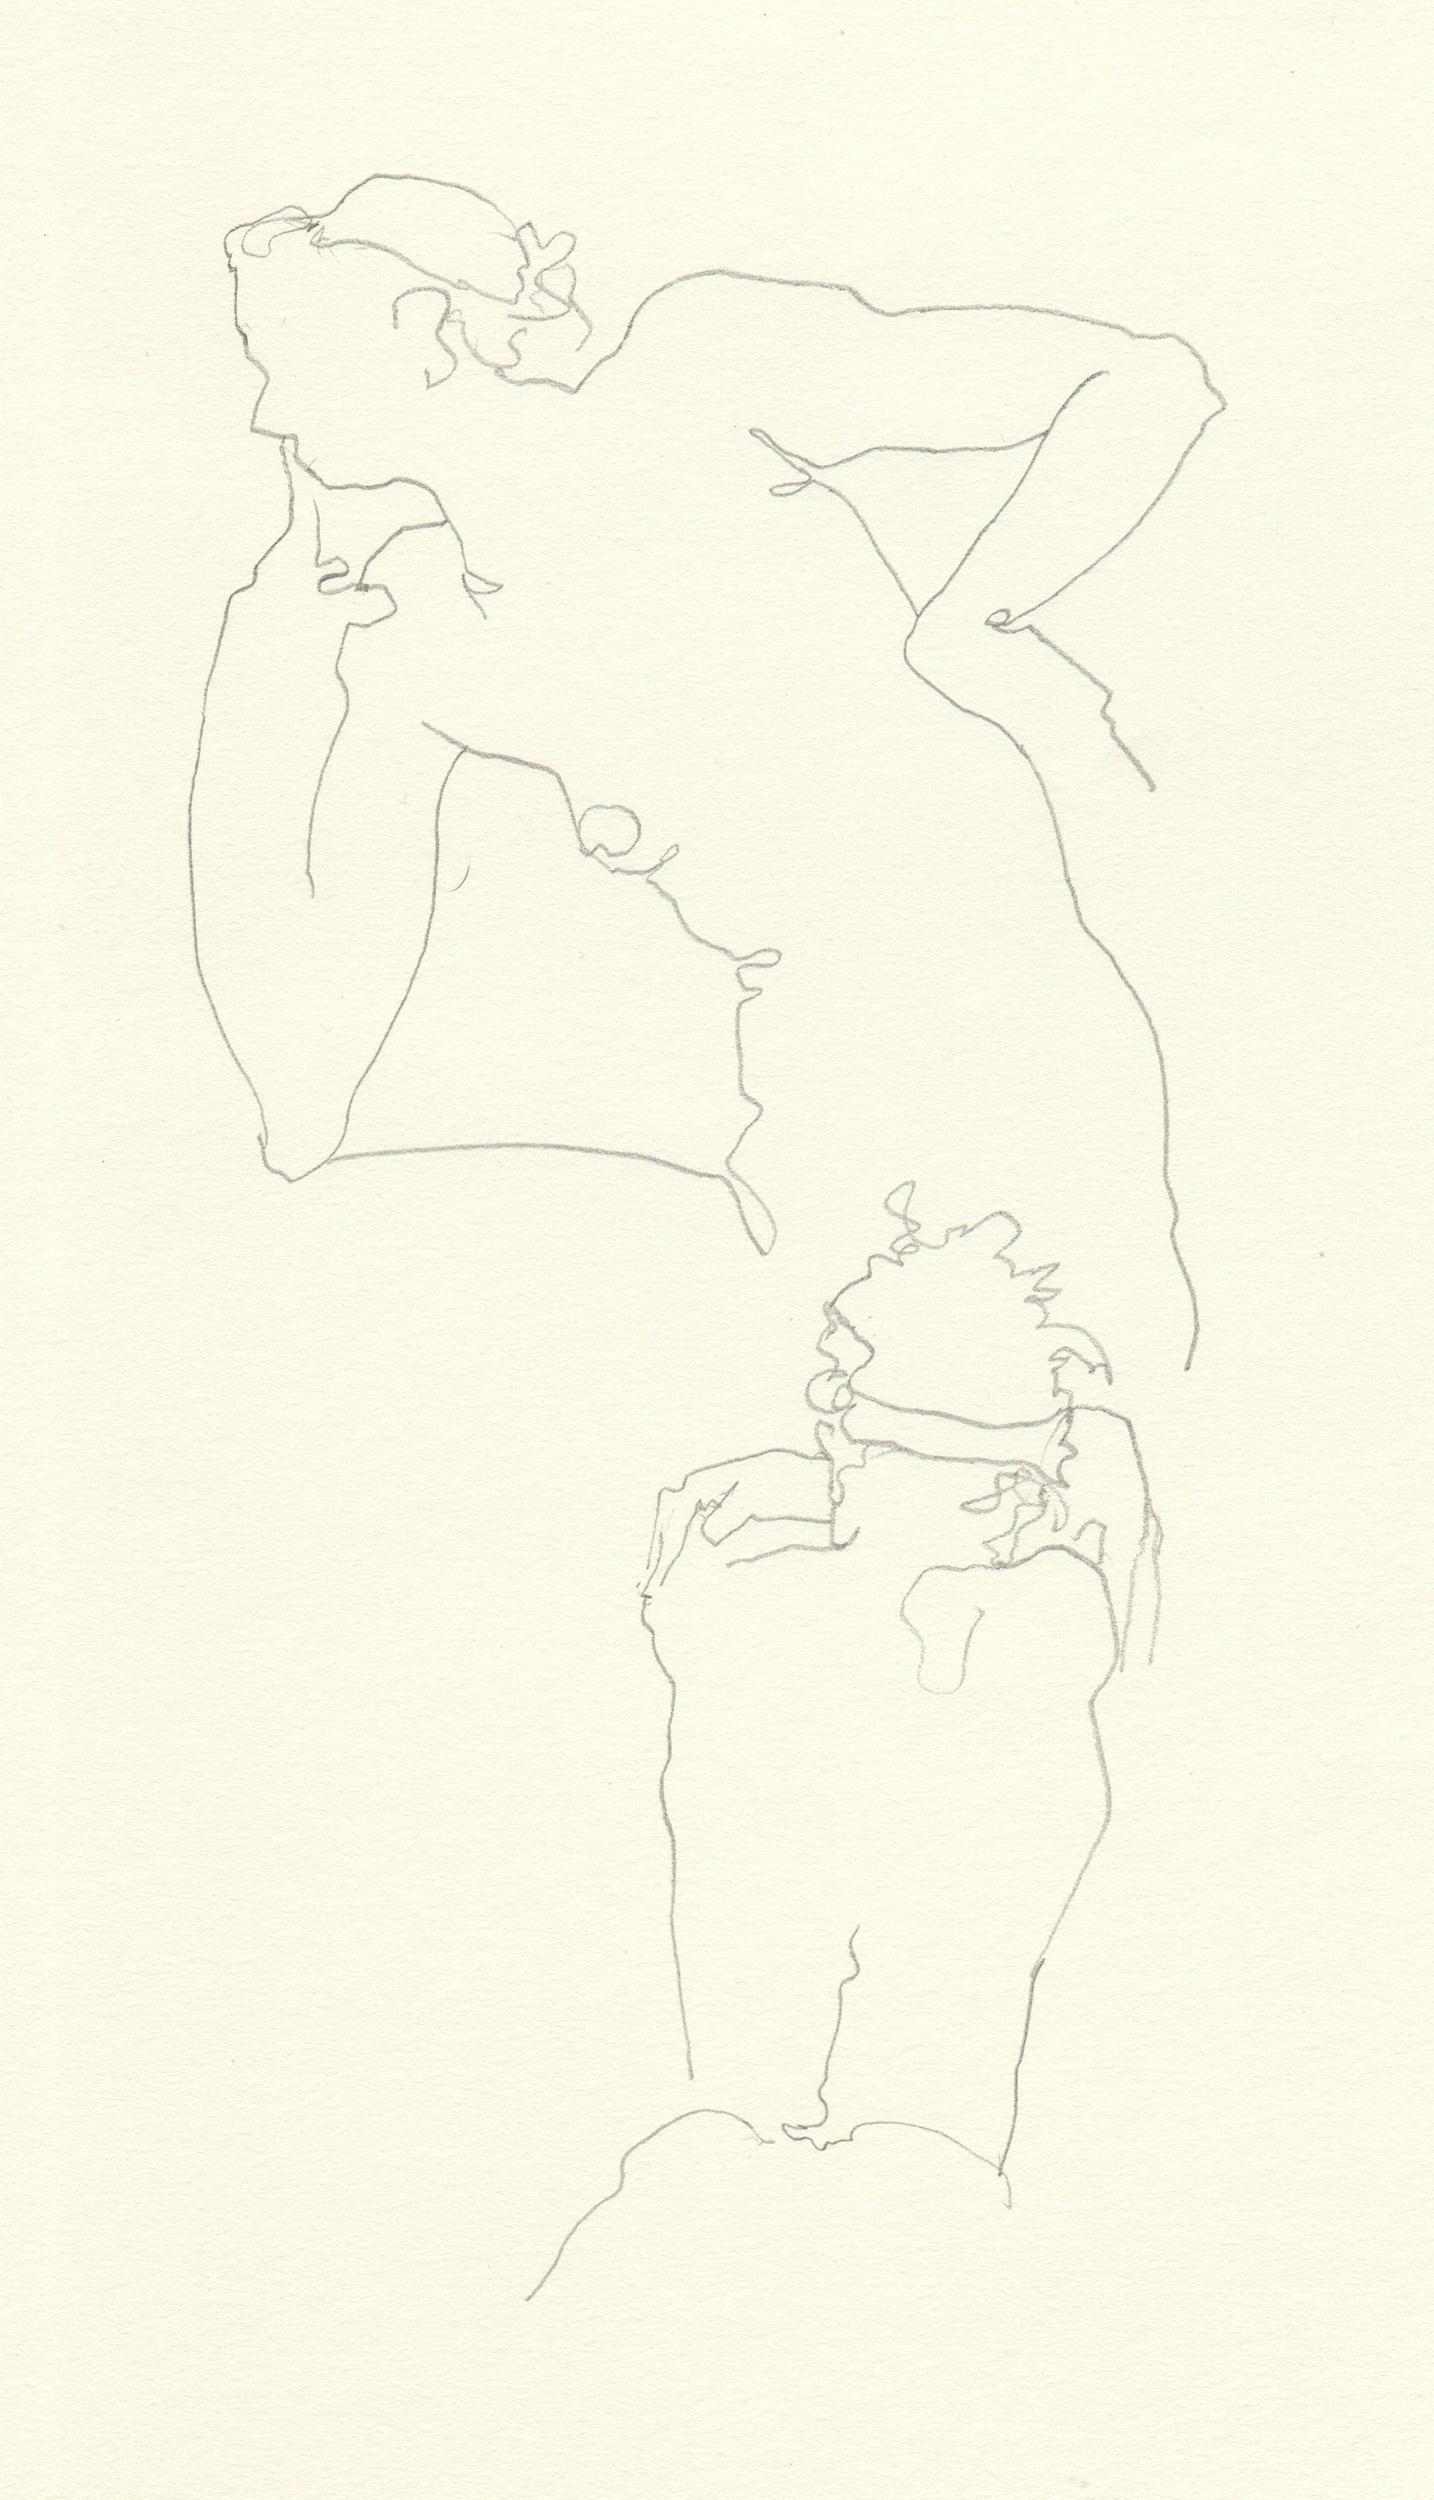 2012_Sketch_F-Beudin_077